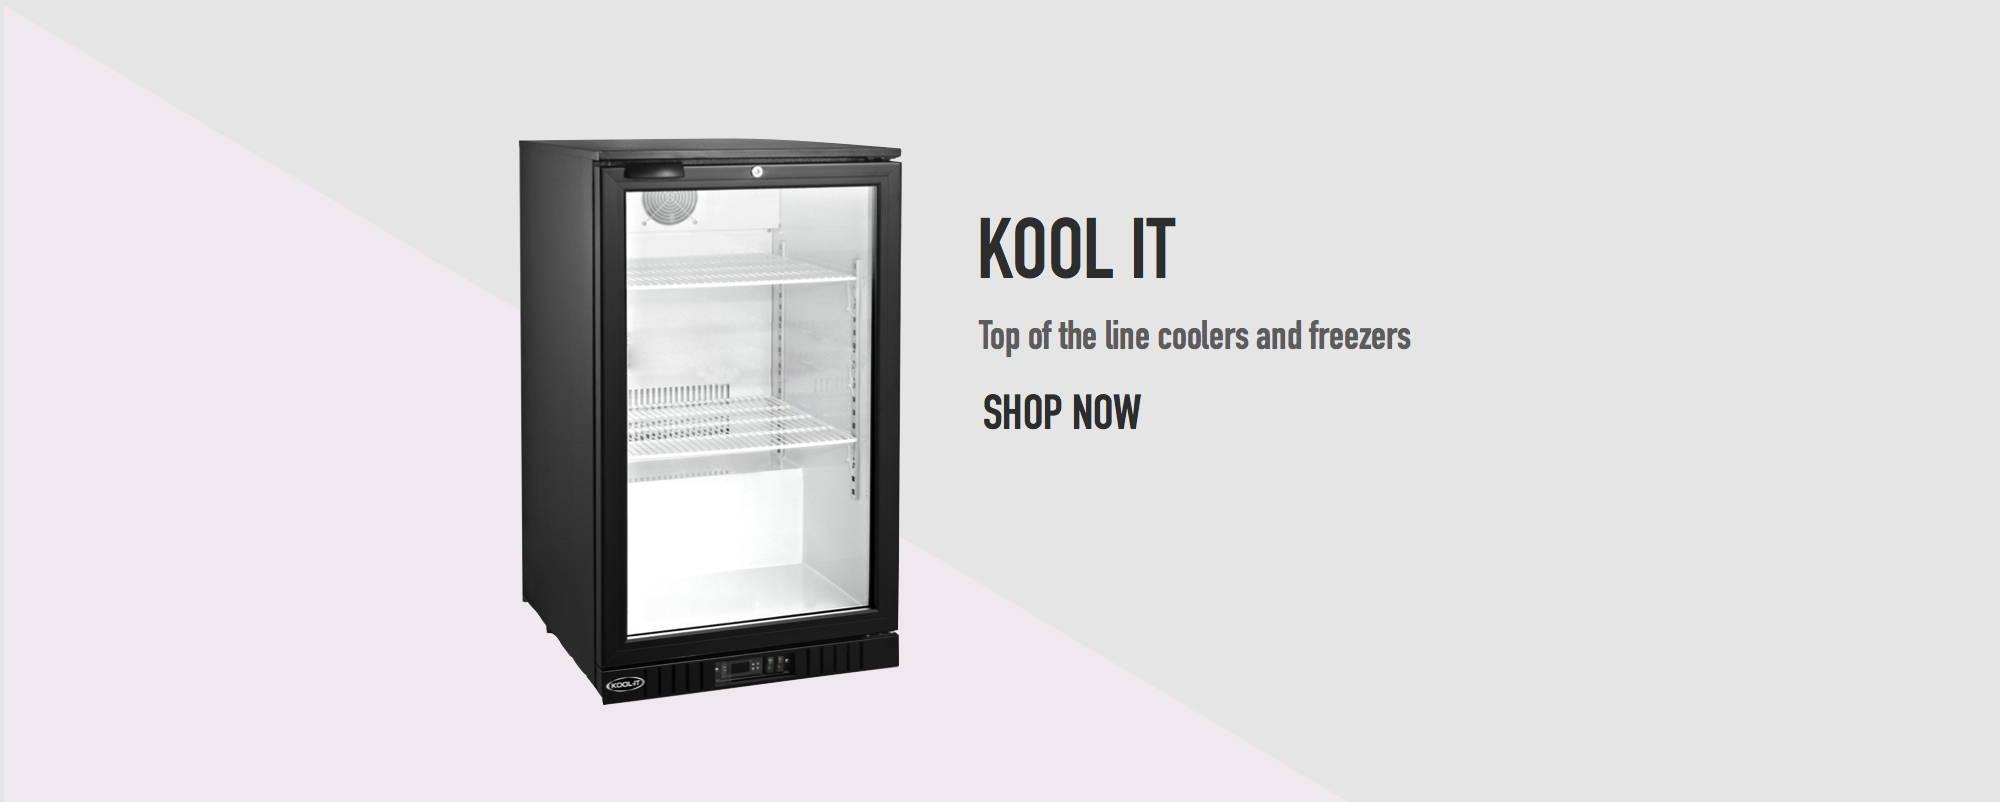 Kool It Coolers and Freezers